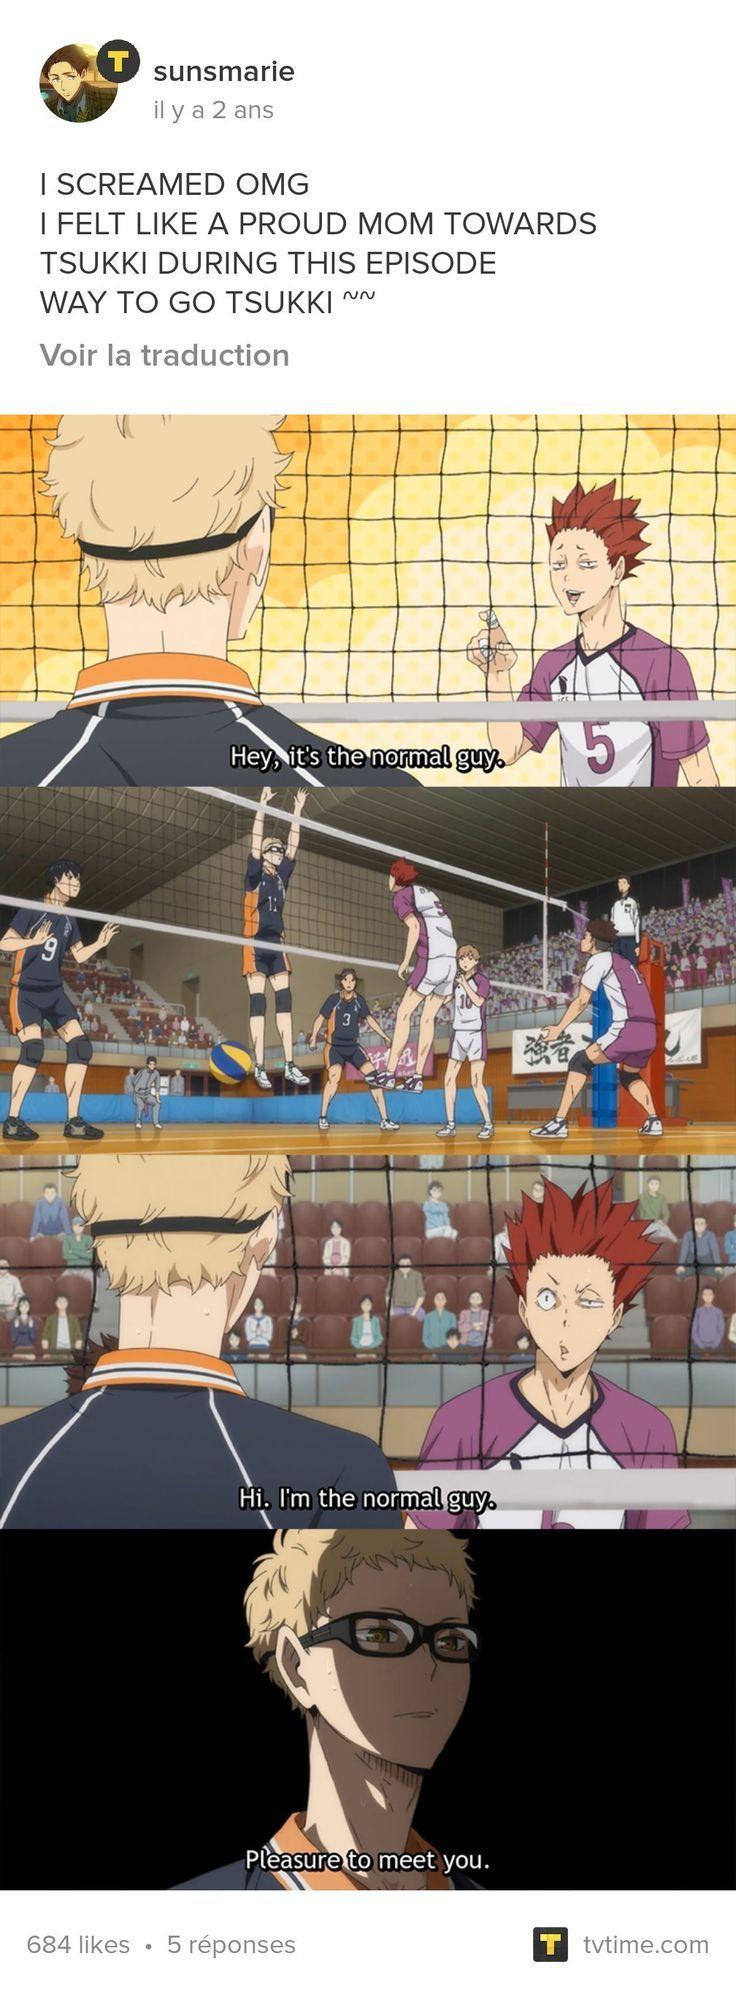 Never Mess With Tsukki He Always Has A Comeback Comeback Mess Tsukki Haikyuu Tsukishima Haikyuu Anime Haikyuu Funny